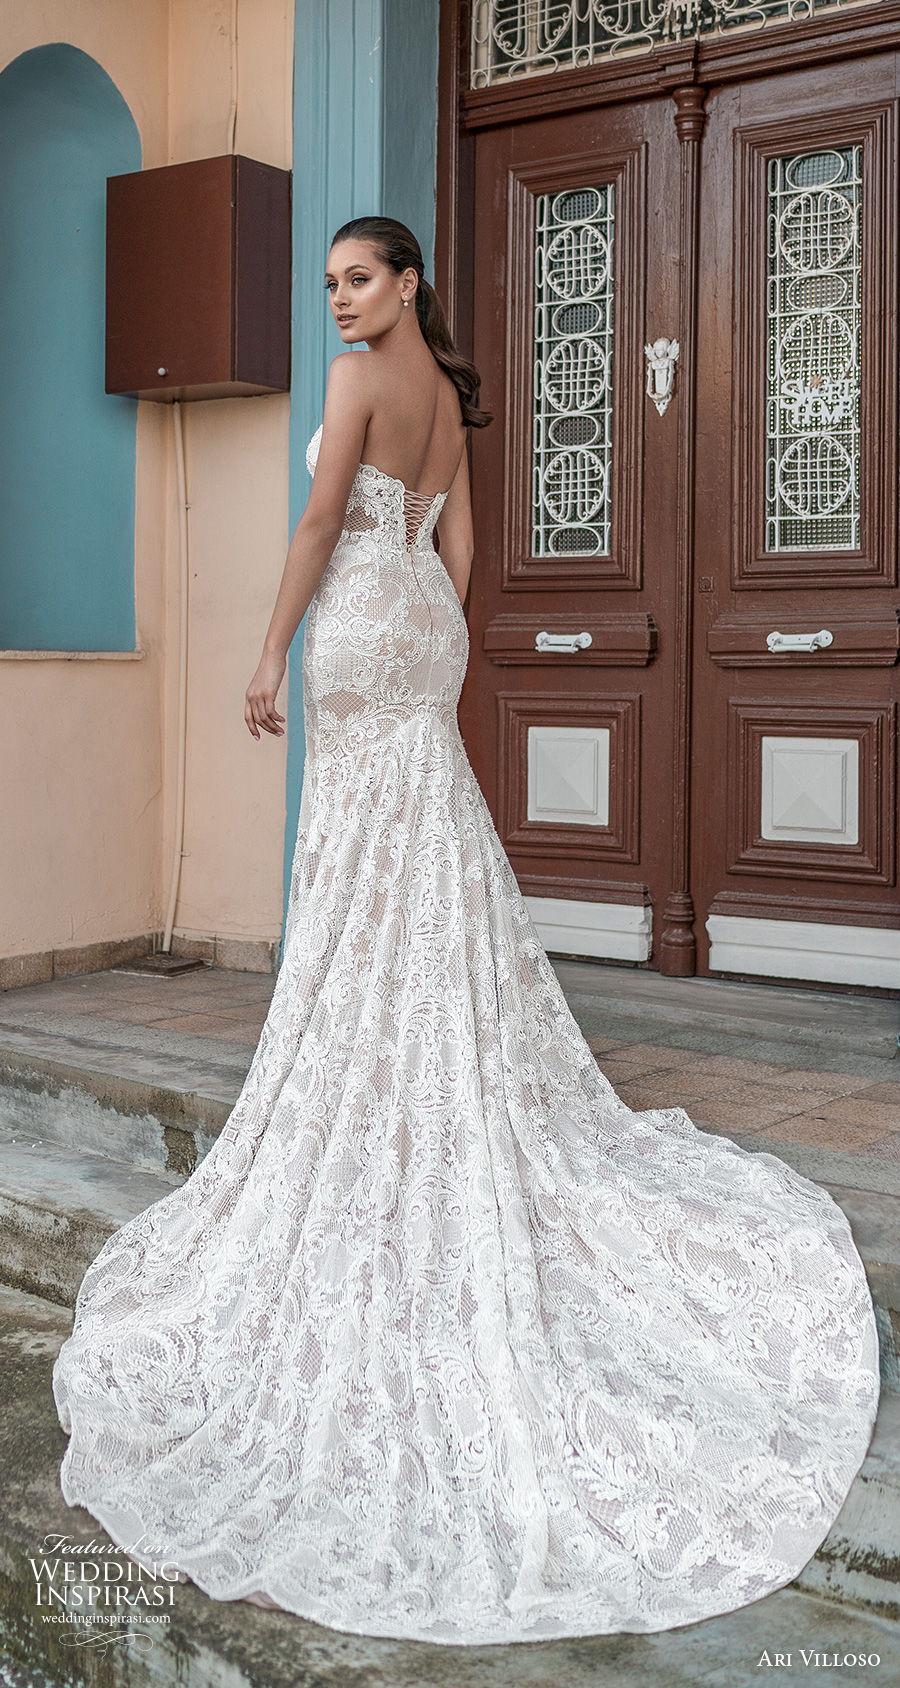 ari villoso 2021 bridal strapless sweetheart neckline full embellishment glamorous elegant fit and flare wedding dress corset back chapel train (10) bv